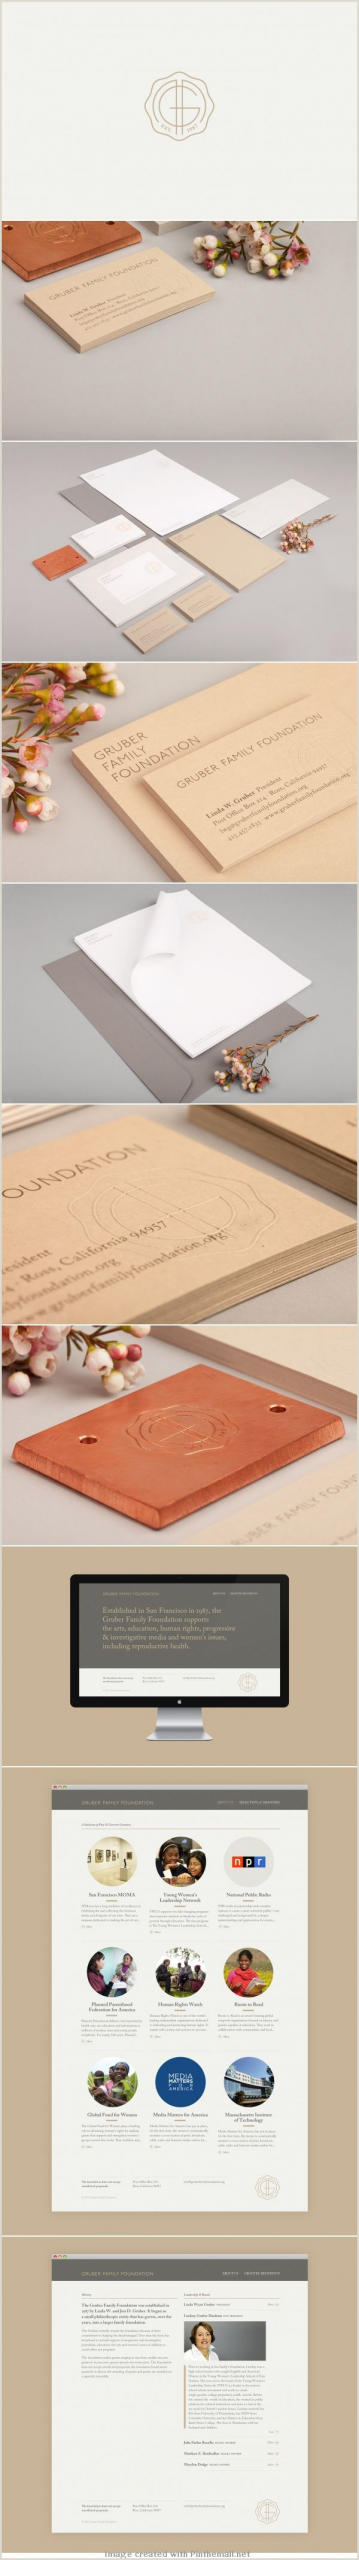 Pile Of Business Cards 14 Popular Hardwood Flooring Business Card Template